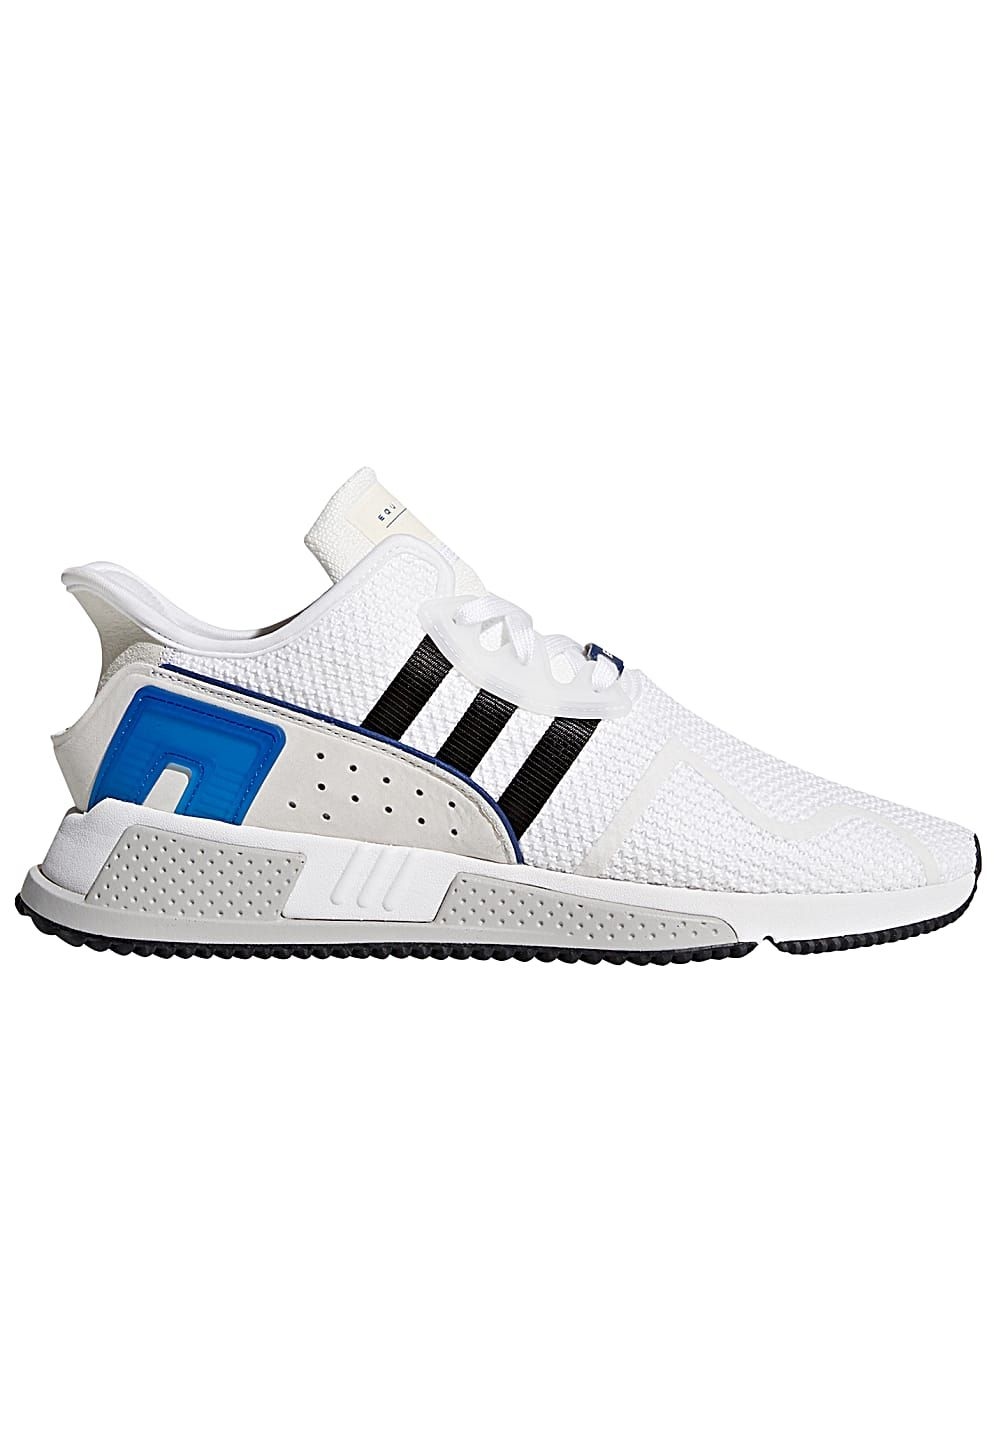 sale retailer f2f62 7b754 Adidas Eqt Cushion Adv - Baskets pour Homme - Blanc